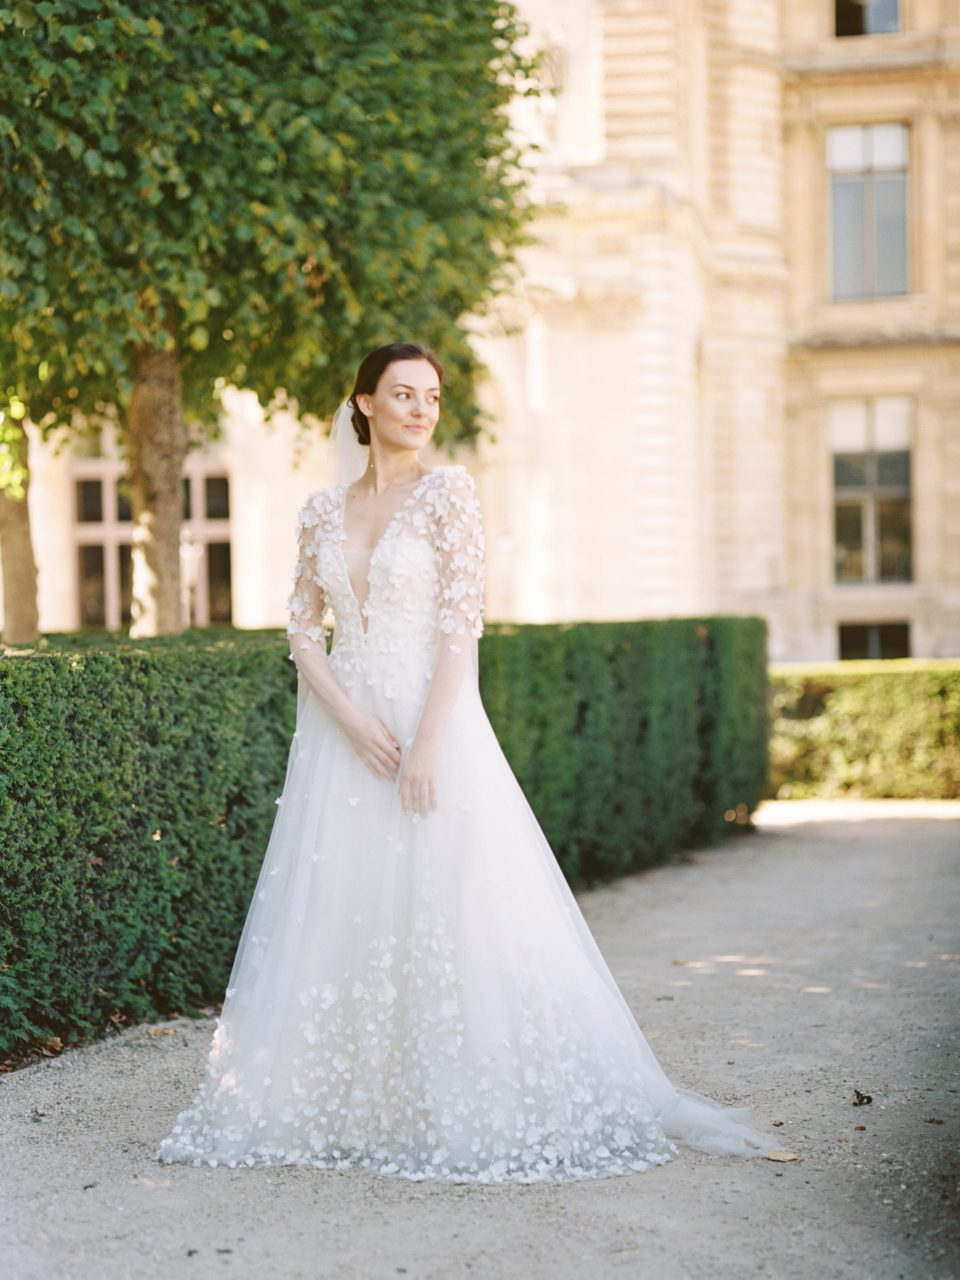 Destination Fine Art Wedding Editorial Photography in Paris with Max Chaoul - Matt Erickson Photography